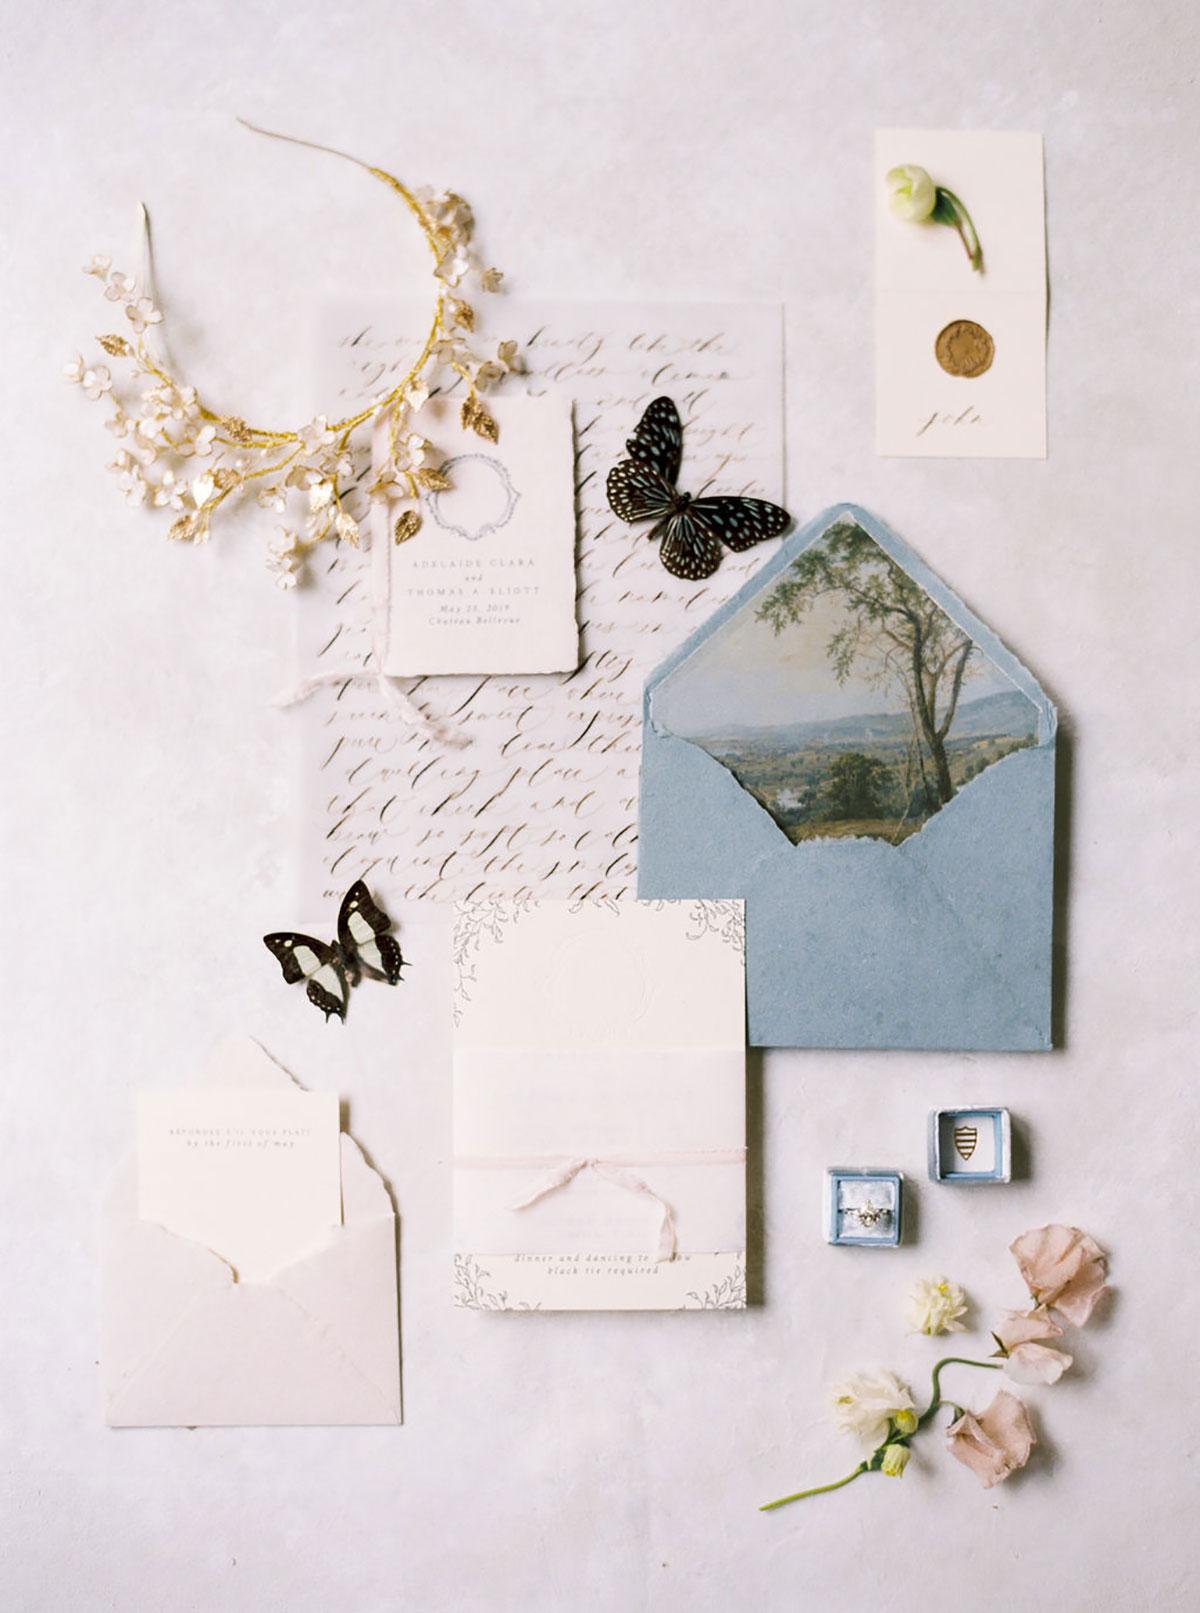 sourced-co-jade-magnolia-flat-lay-styling-workshop-8.jpg